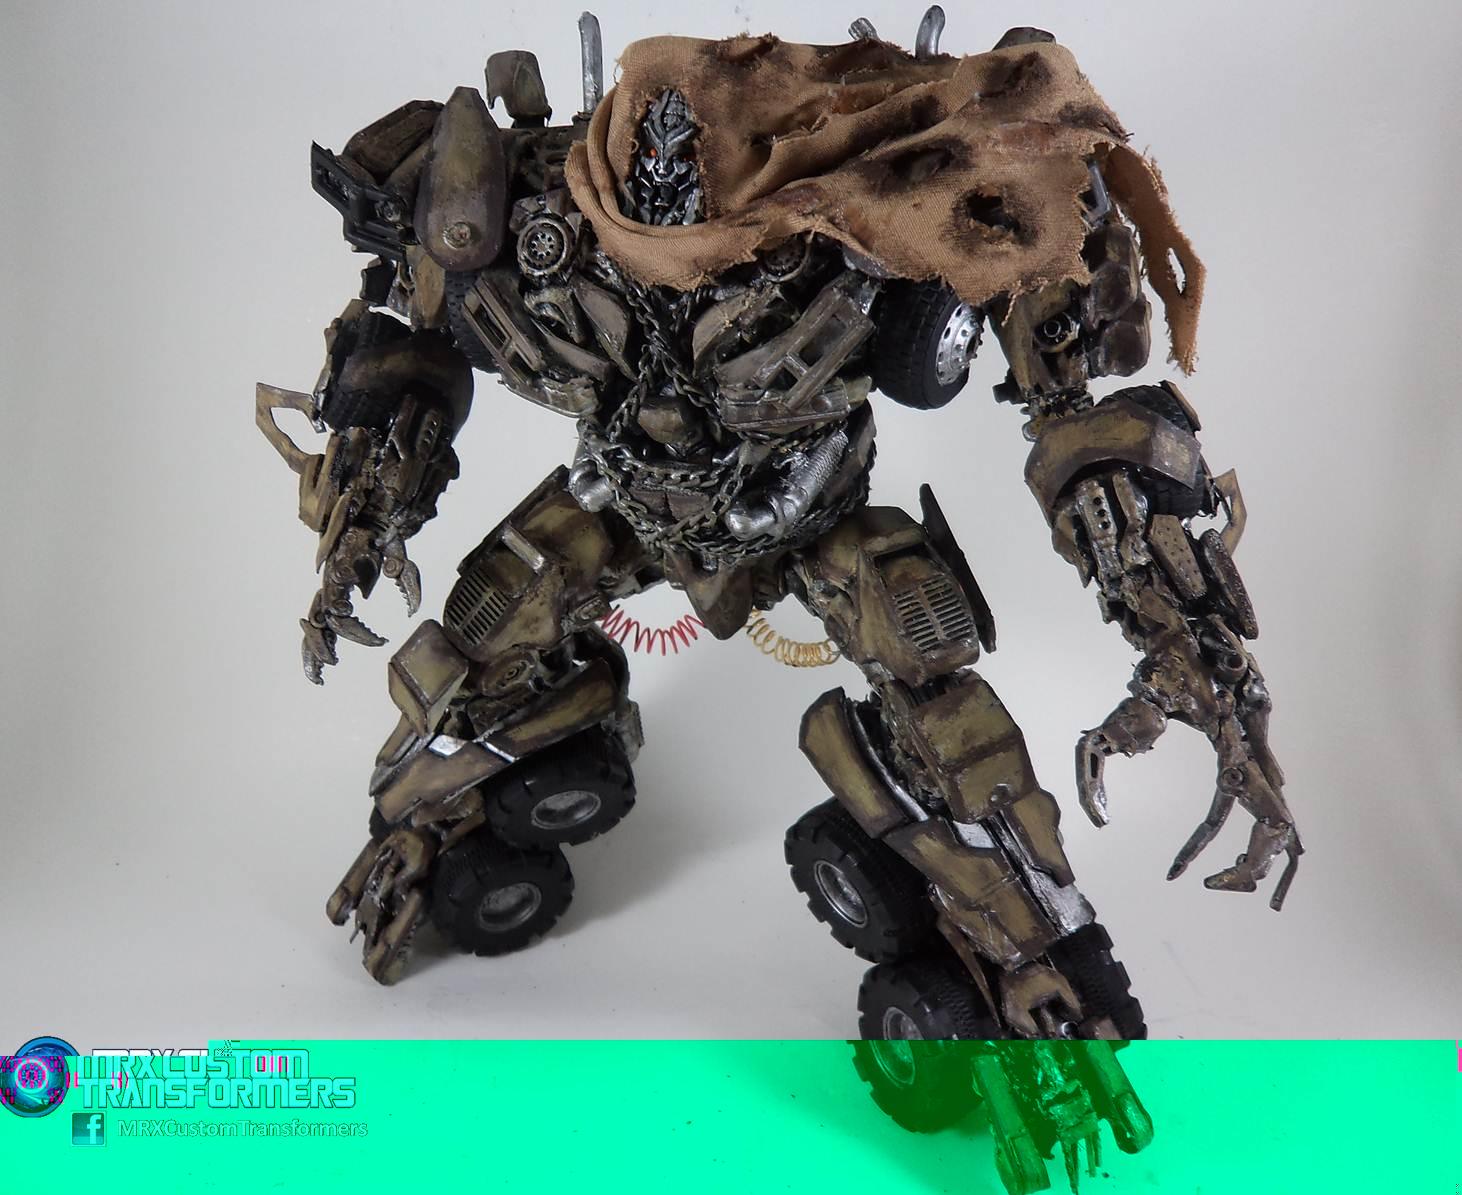 Transformers Dotm Leader Class Megatron Leader Class Megatron Dotm v3